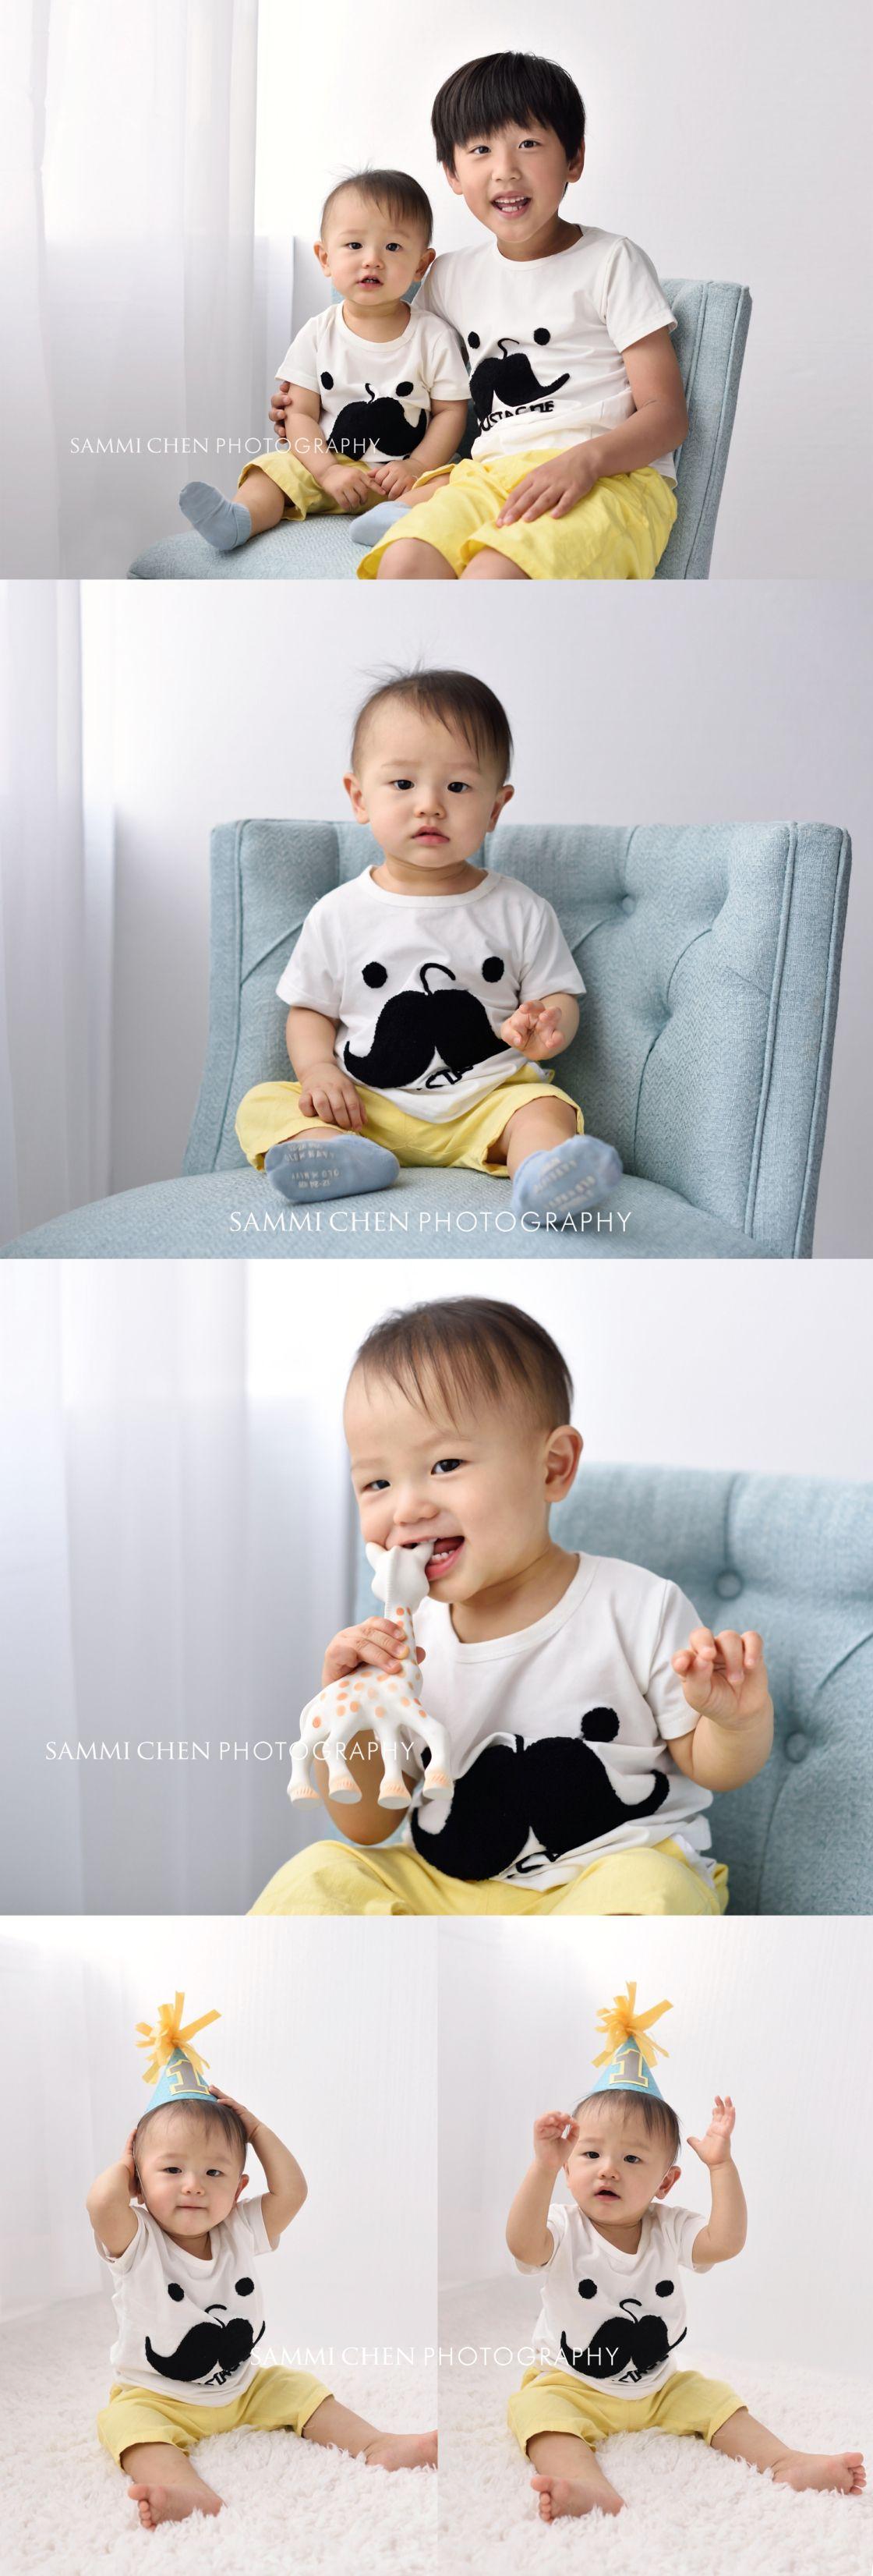 Sammi Chen Photography. Children,family, maternity, newborn photo,Eastvale CA